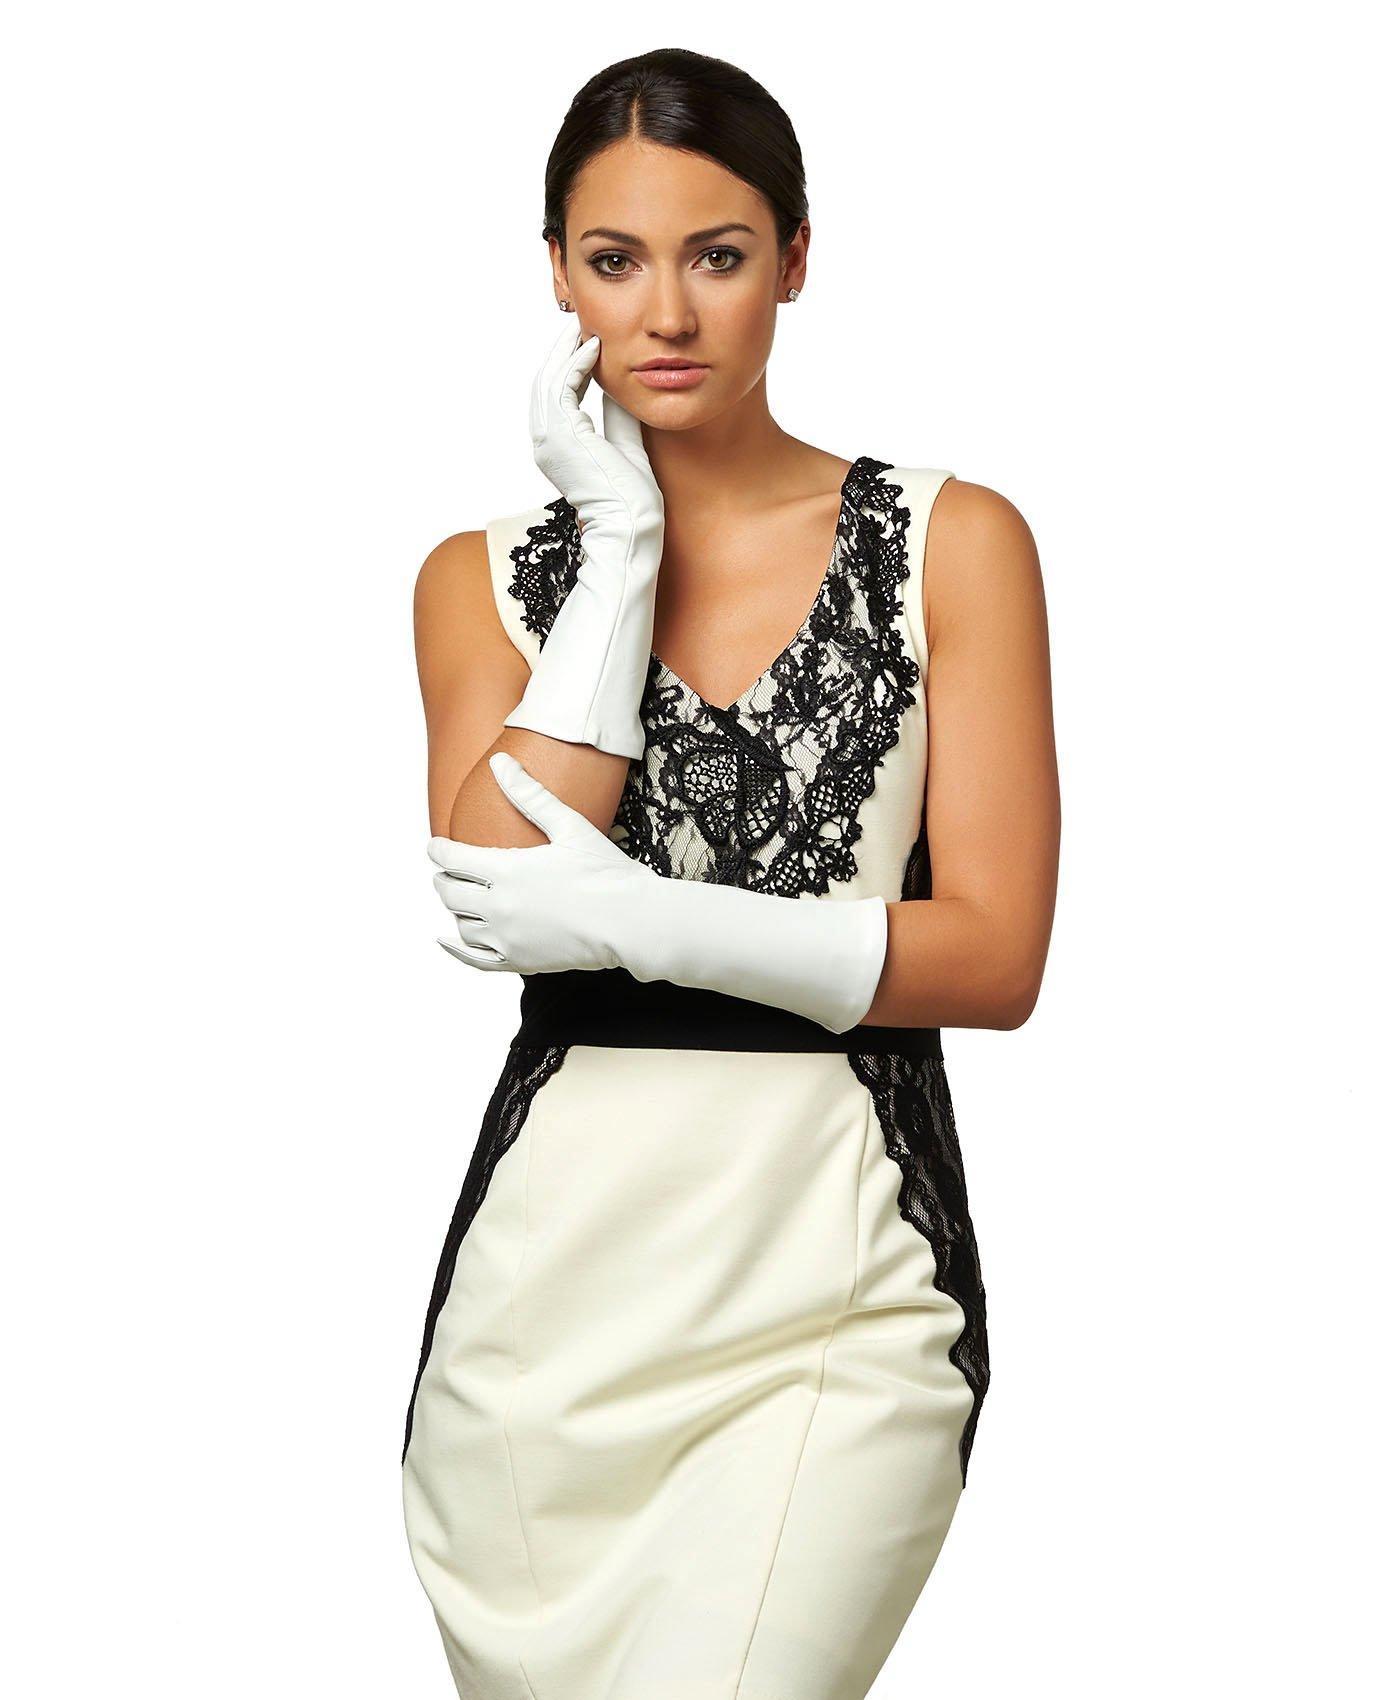 Fratelli Orsini Women's Italian Silk Lined 6-Button Length Bridal Gloves Size 7 1/2 Color White by Fratelli Orsini (Image #5)